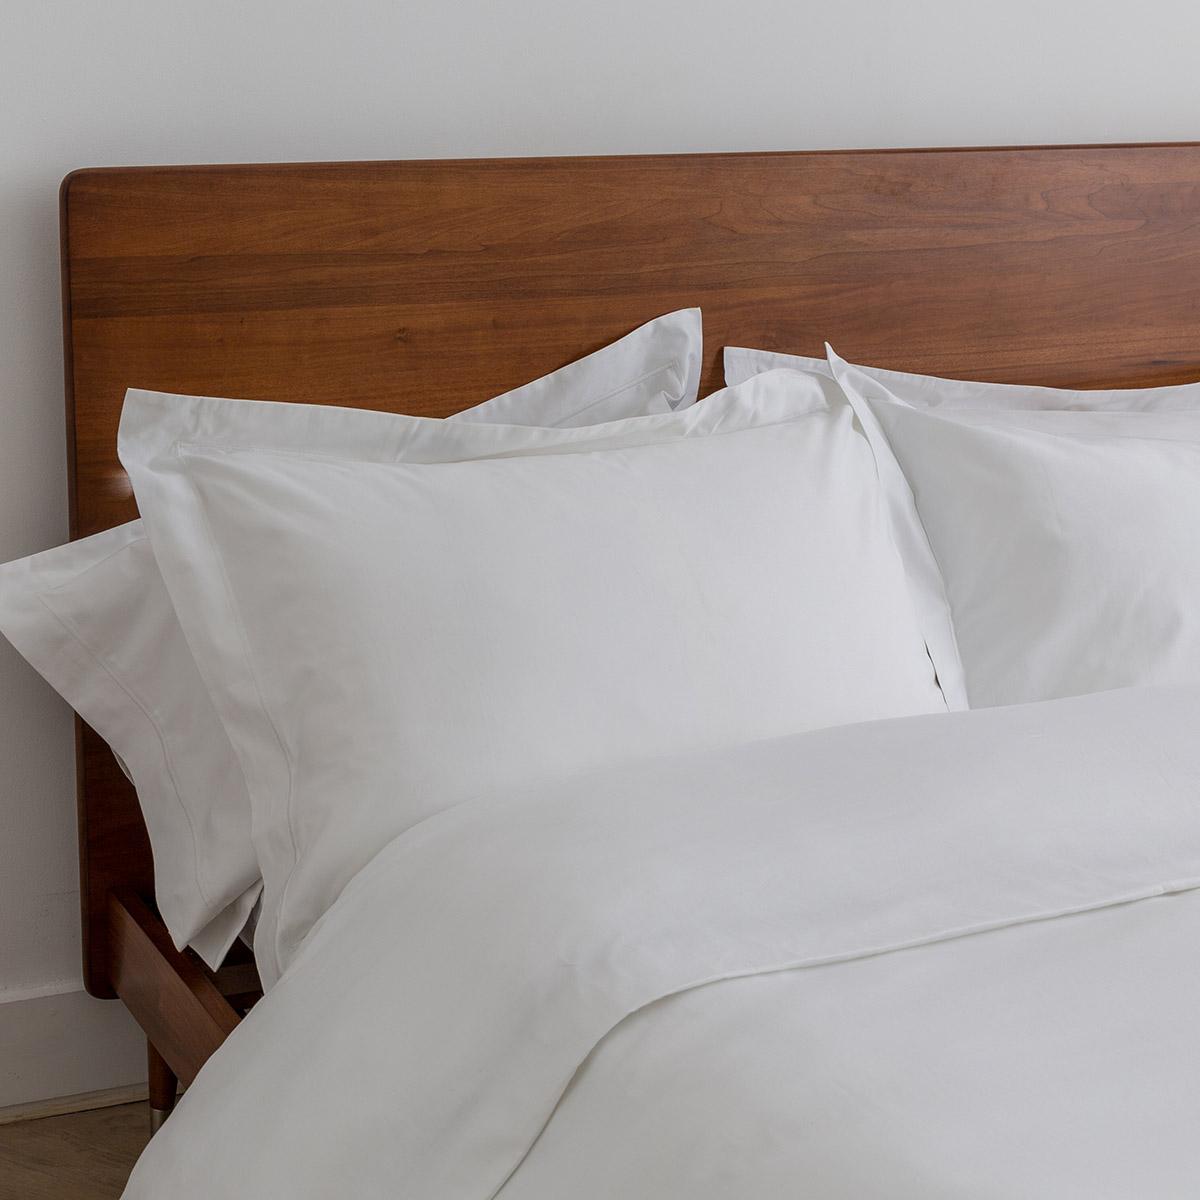 White 600 Thread Count Egyptian Cotton King Size Bed Set